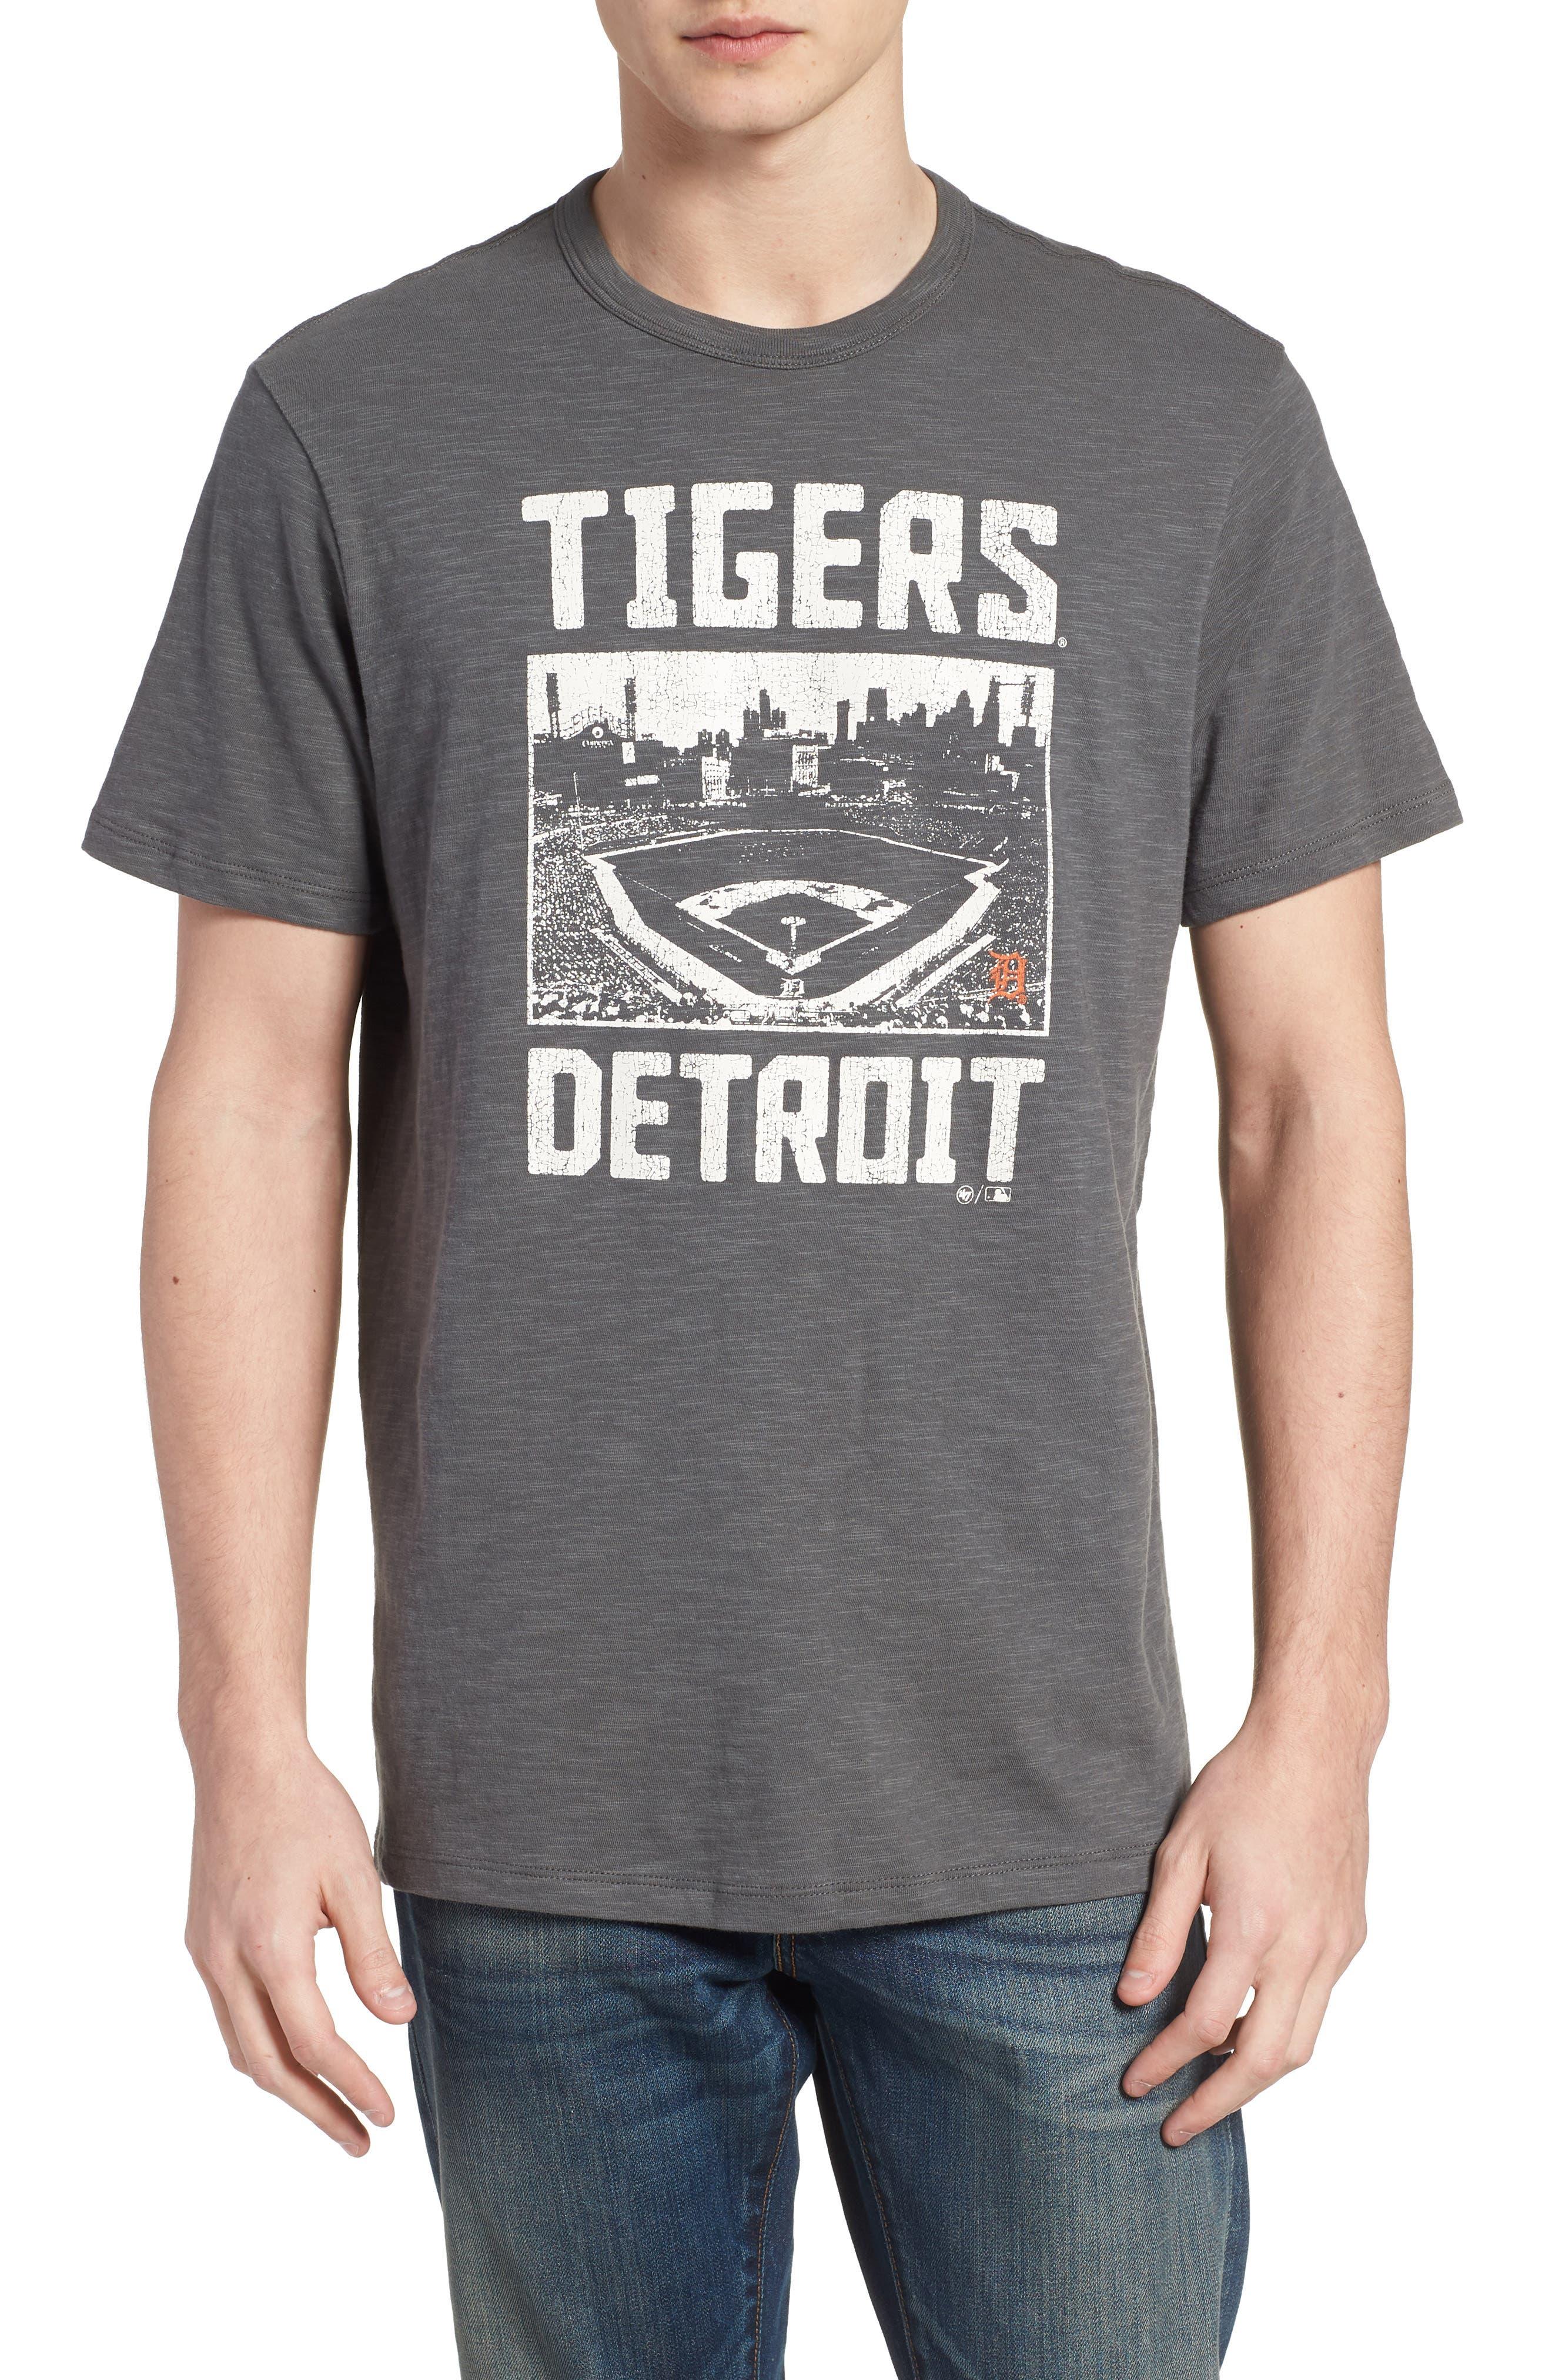 MLB Overdrive Scrum Detroit Tigers T-Shirt,                             Main thumbnail 1, color,                             SUBMARINE